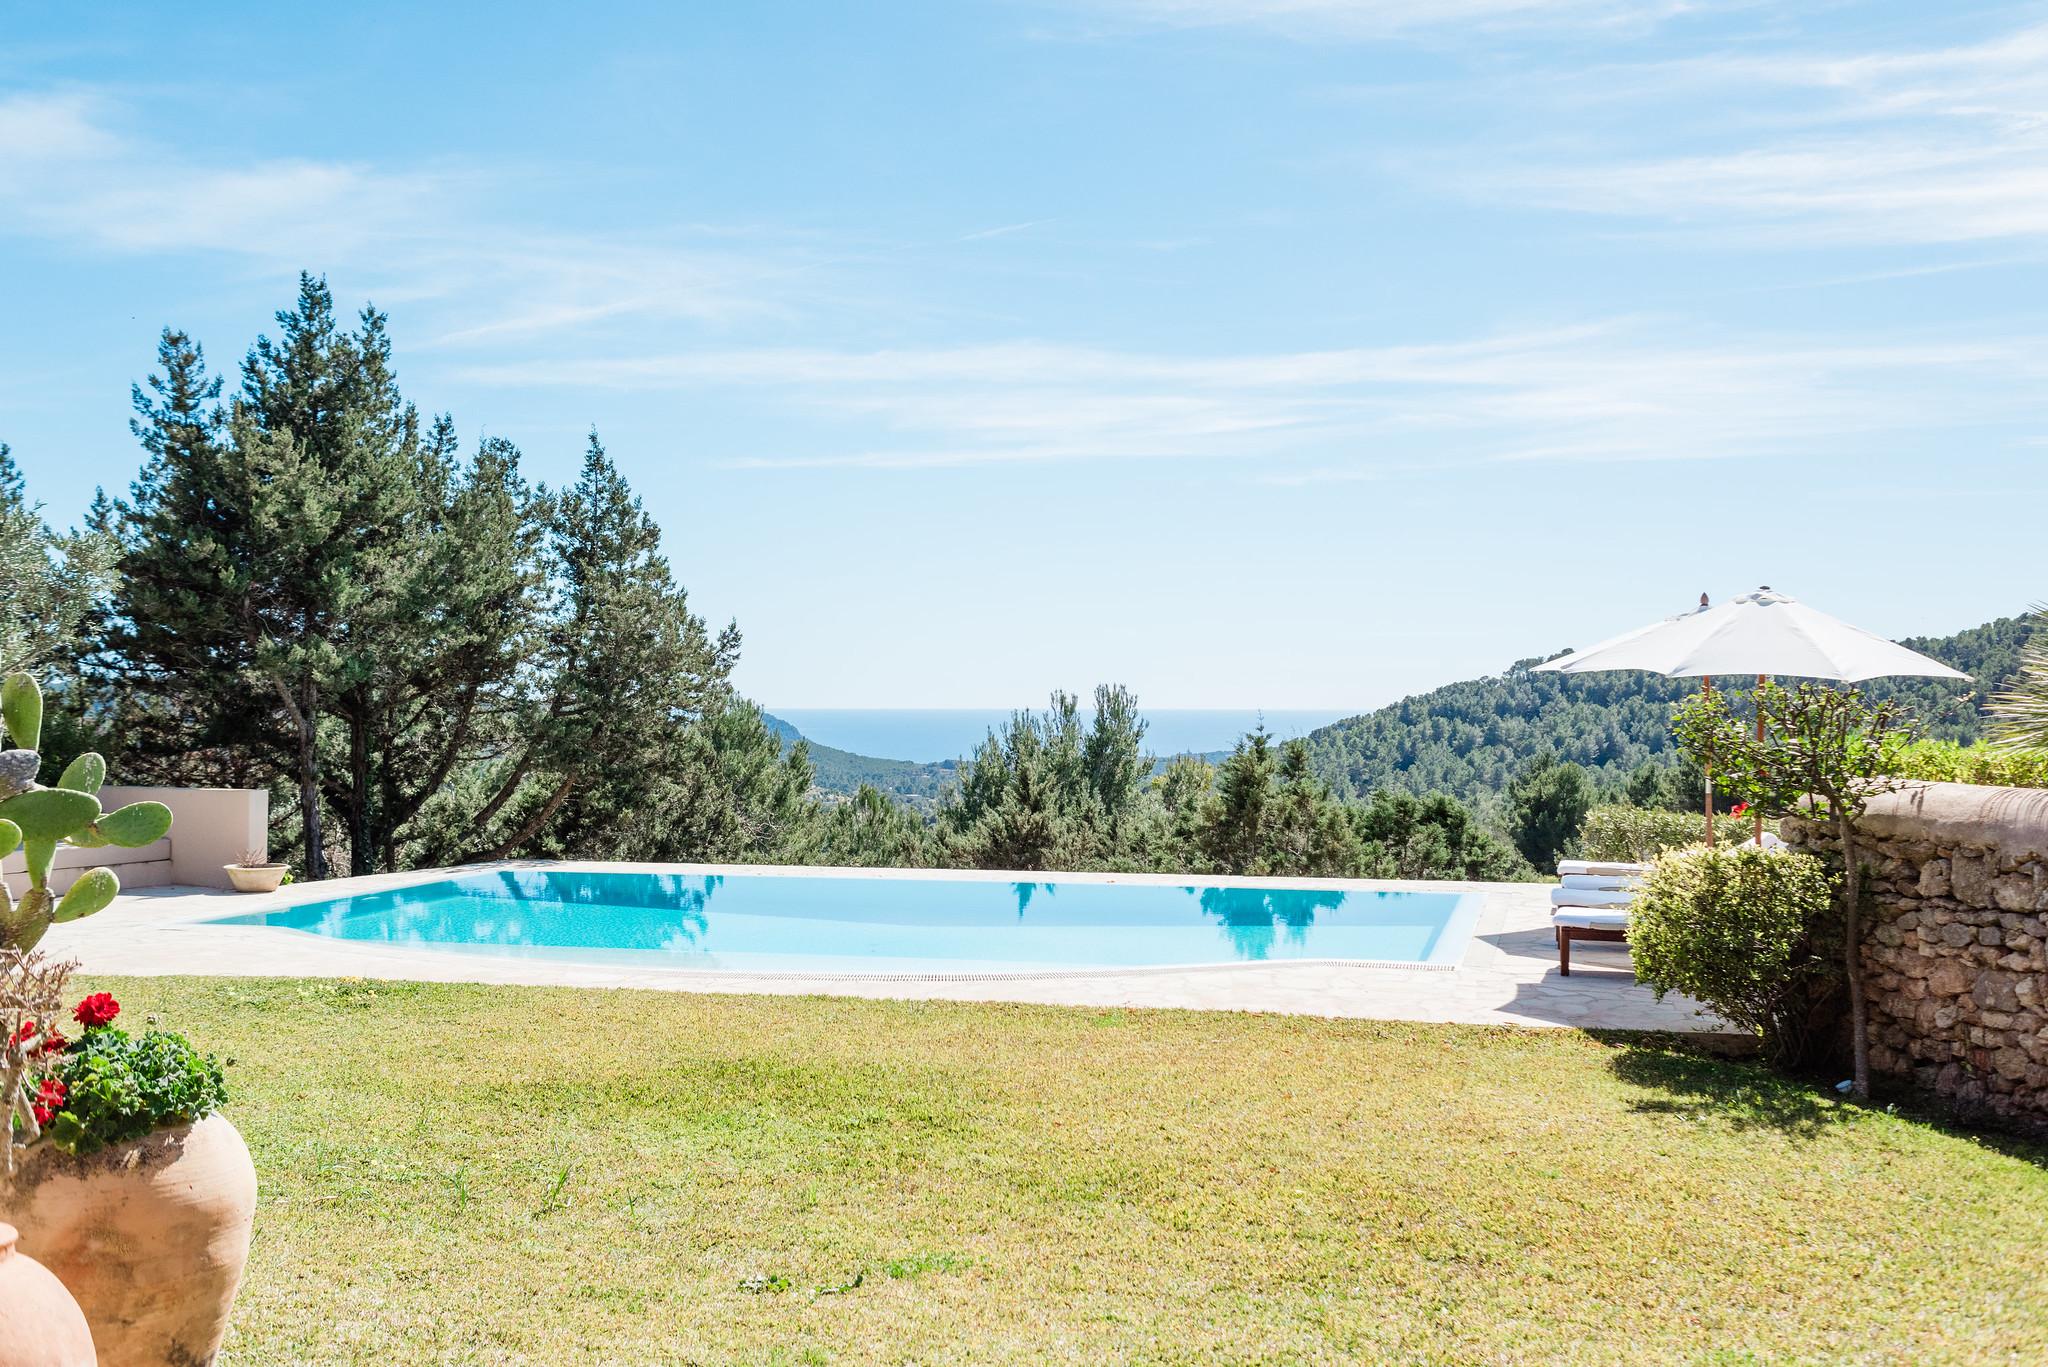 https://www.white-ibiza.com/wp-content/uploads/2020/06/white-ibiza-villas-villa-andrea-exterior-poolview.jpg